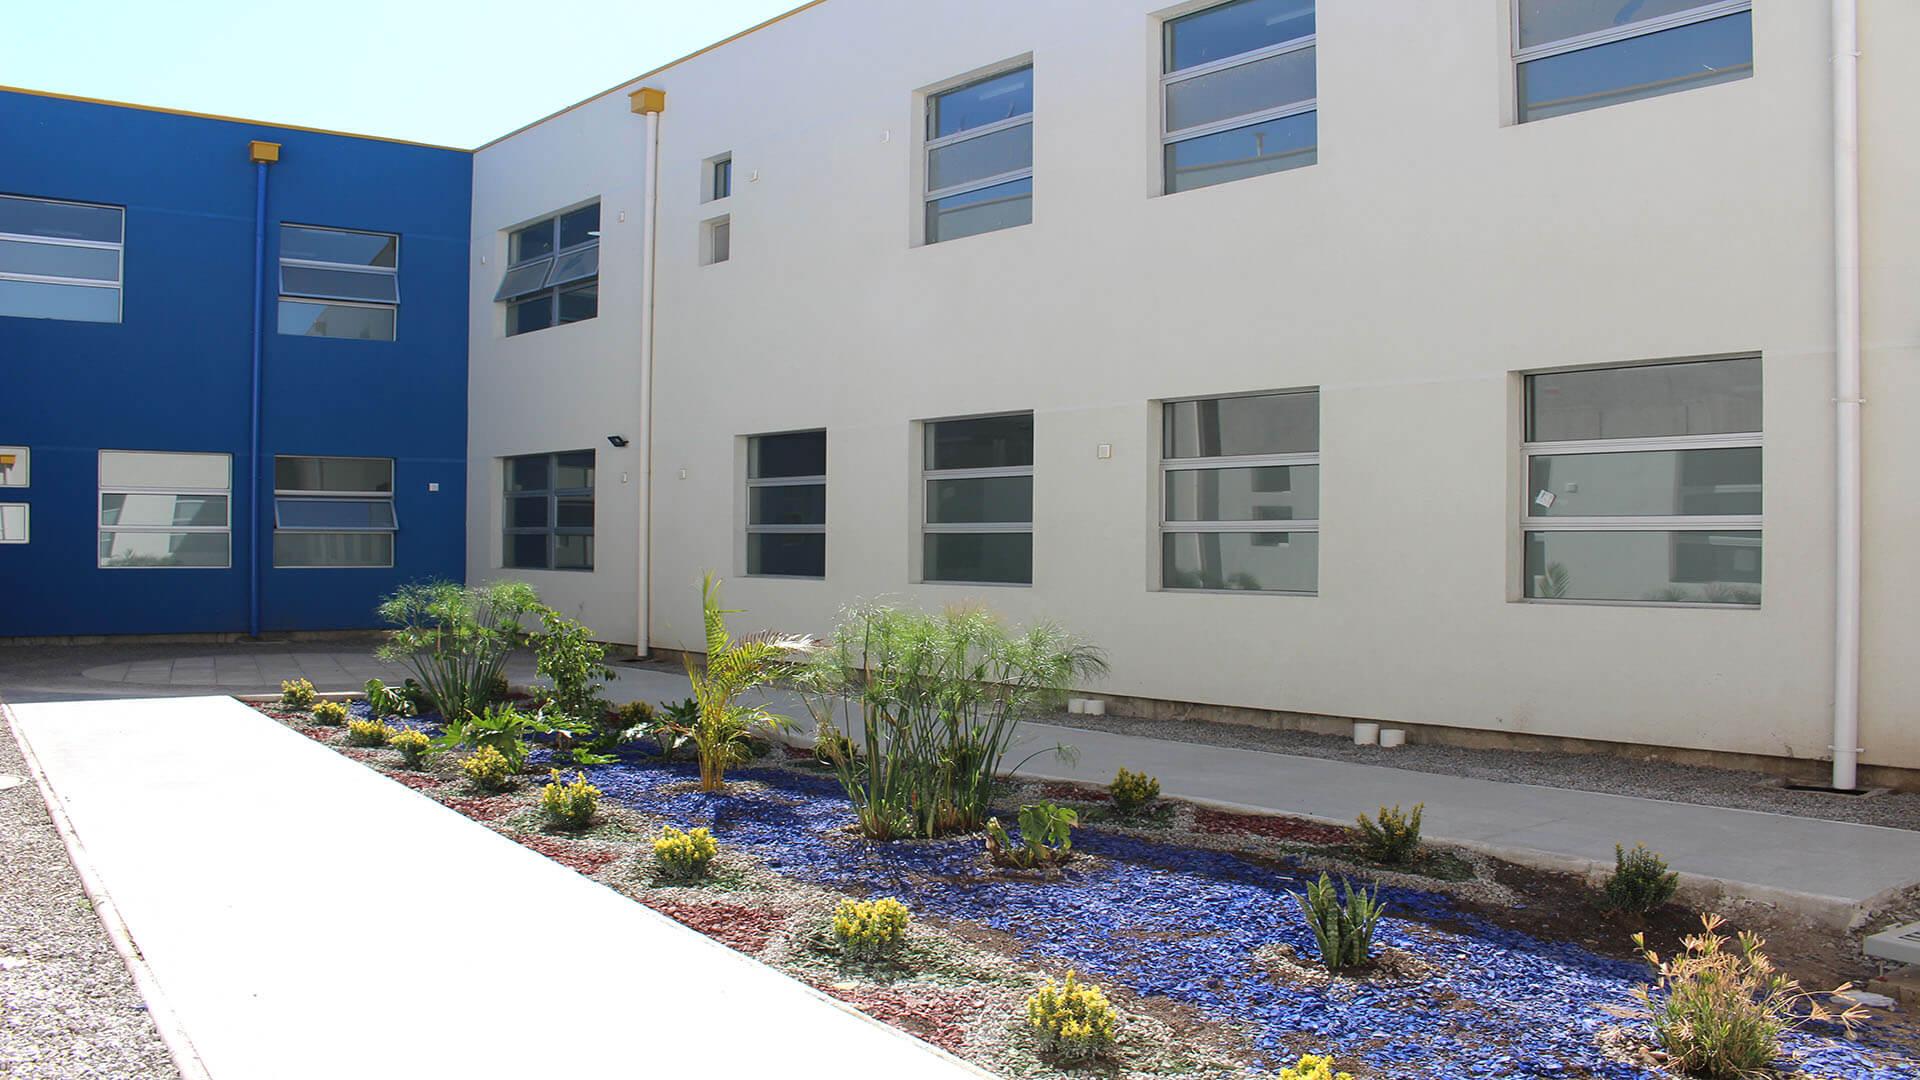 Cesfam-Ovalle-Constructora-Rencoret-Patio-Interior